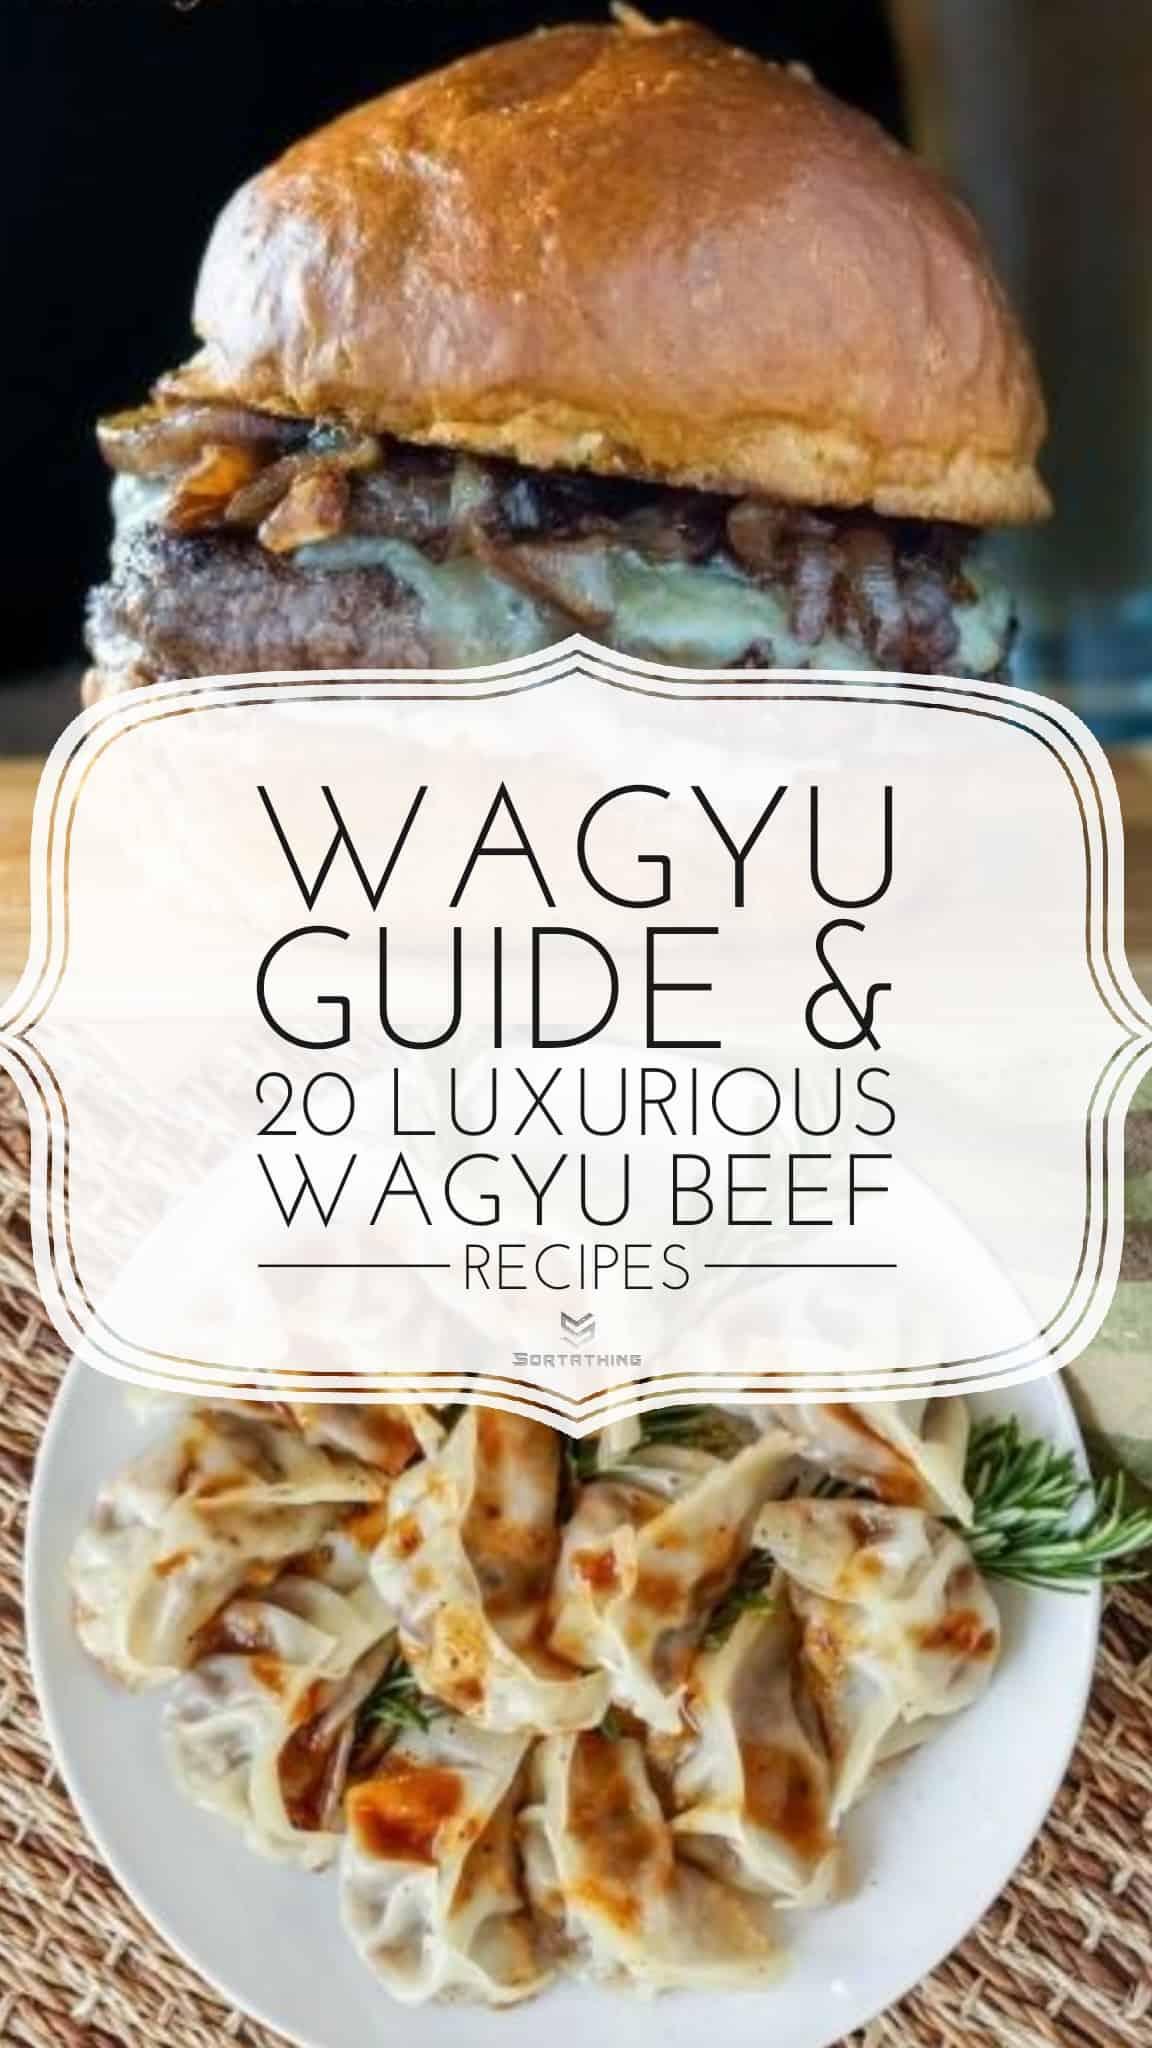 Wagyu Beefburger and Wagyu Beef Gyoza Dumplings